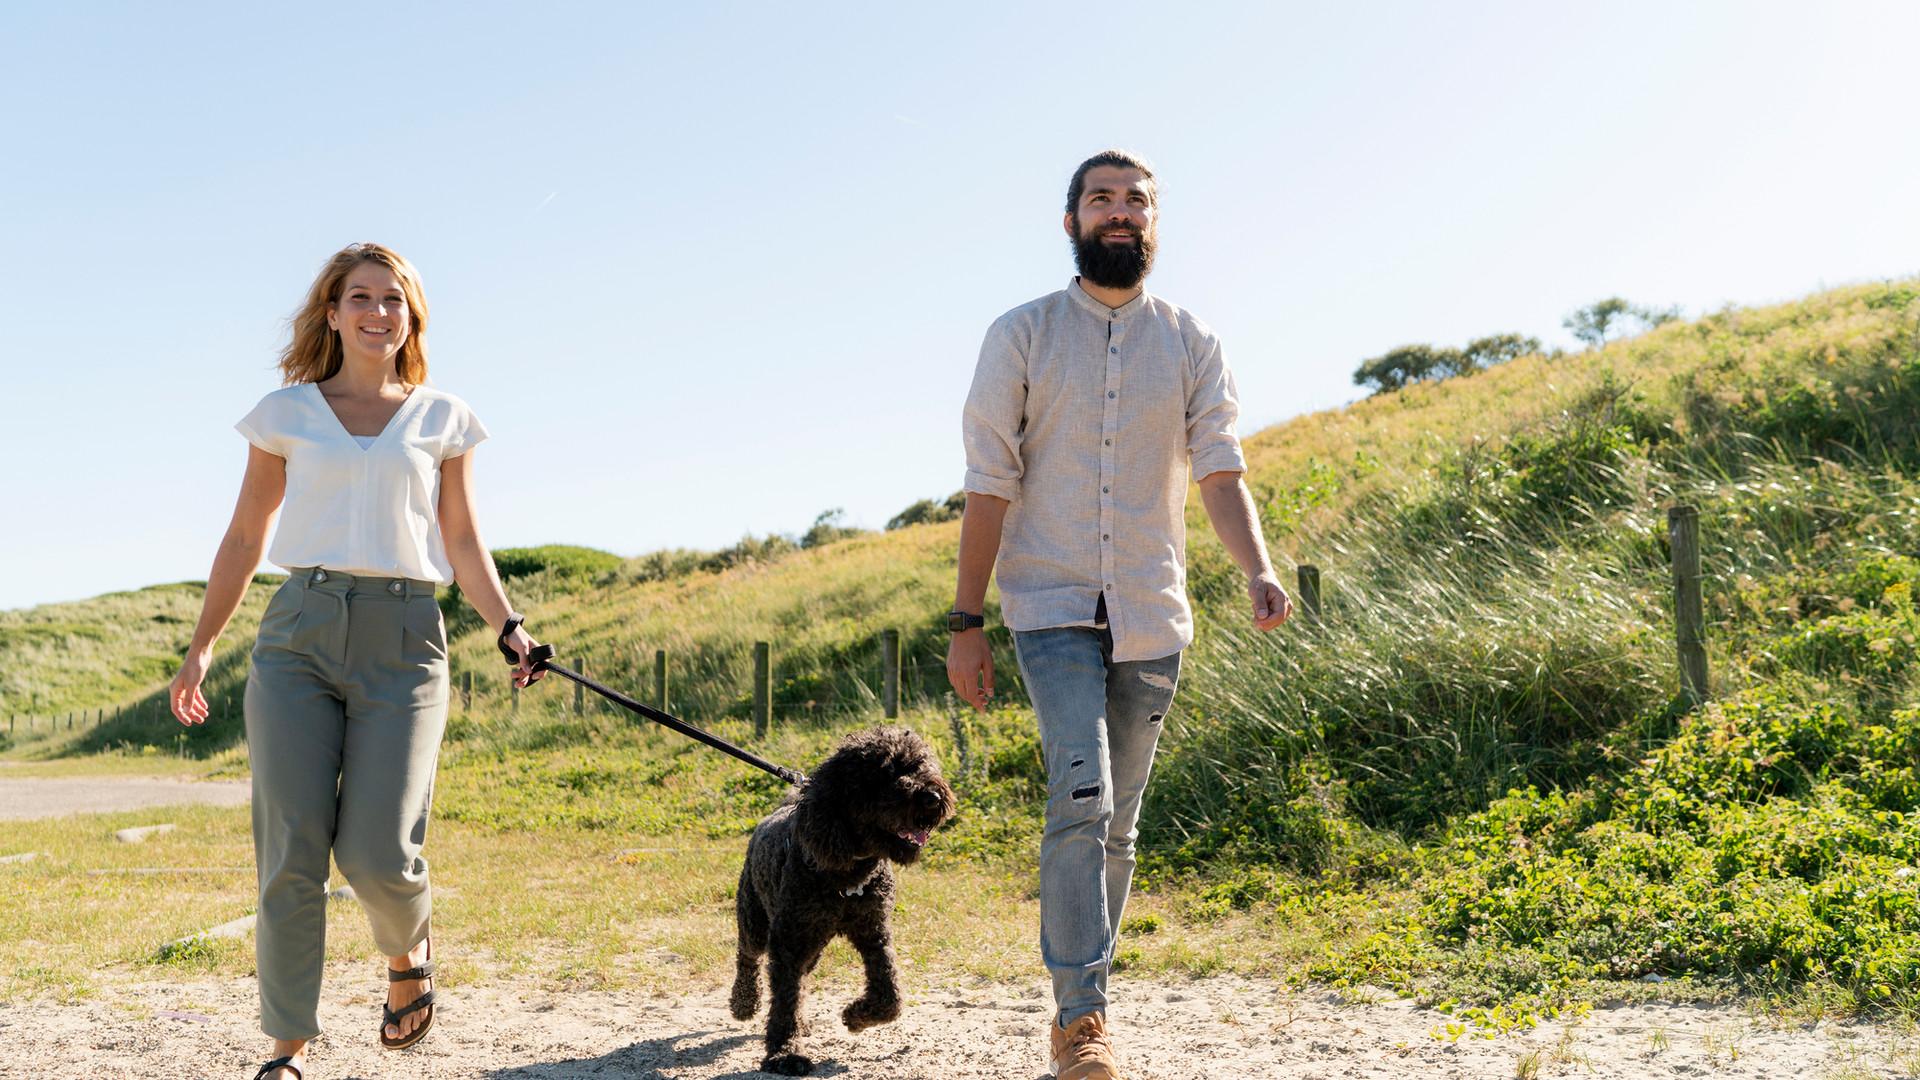 Promener le chien